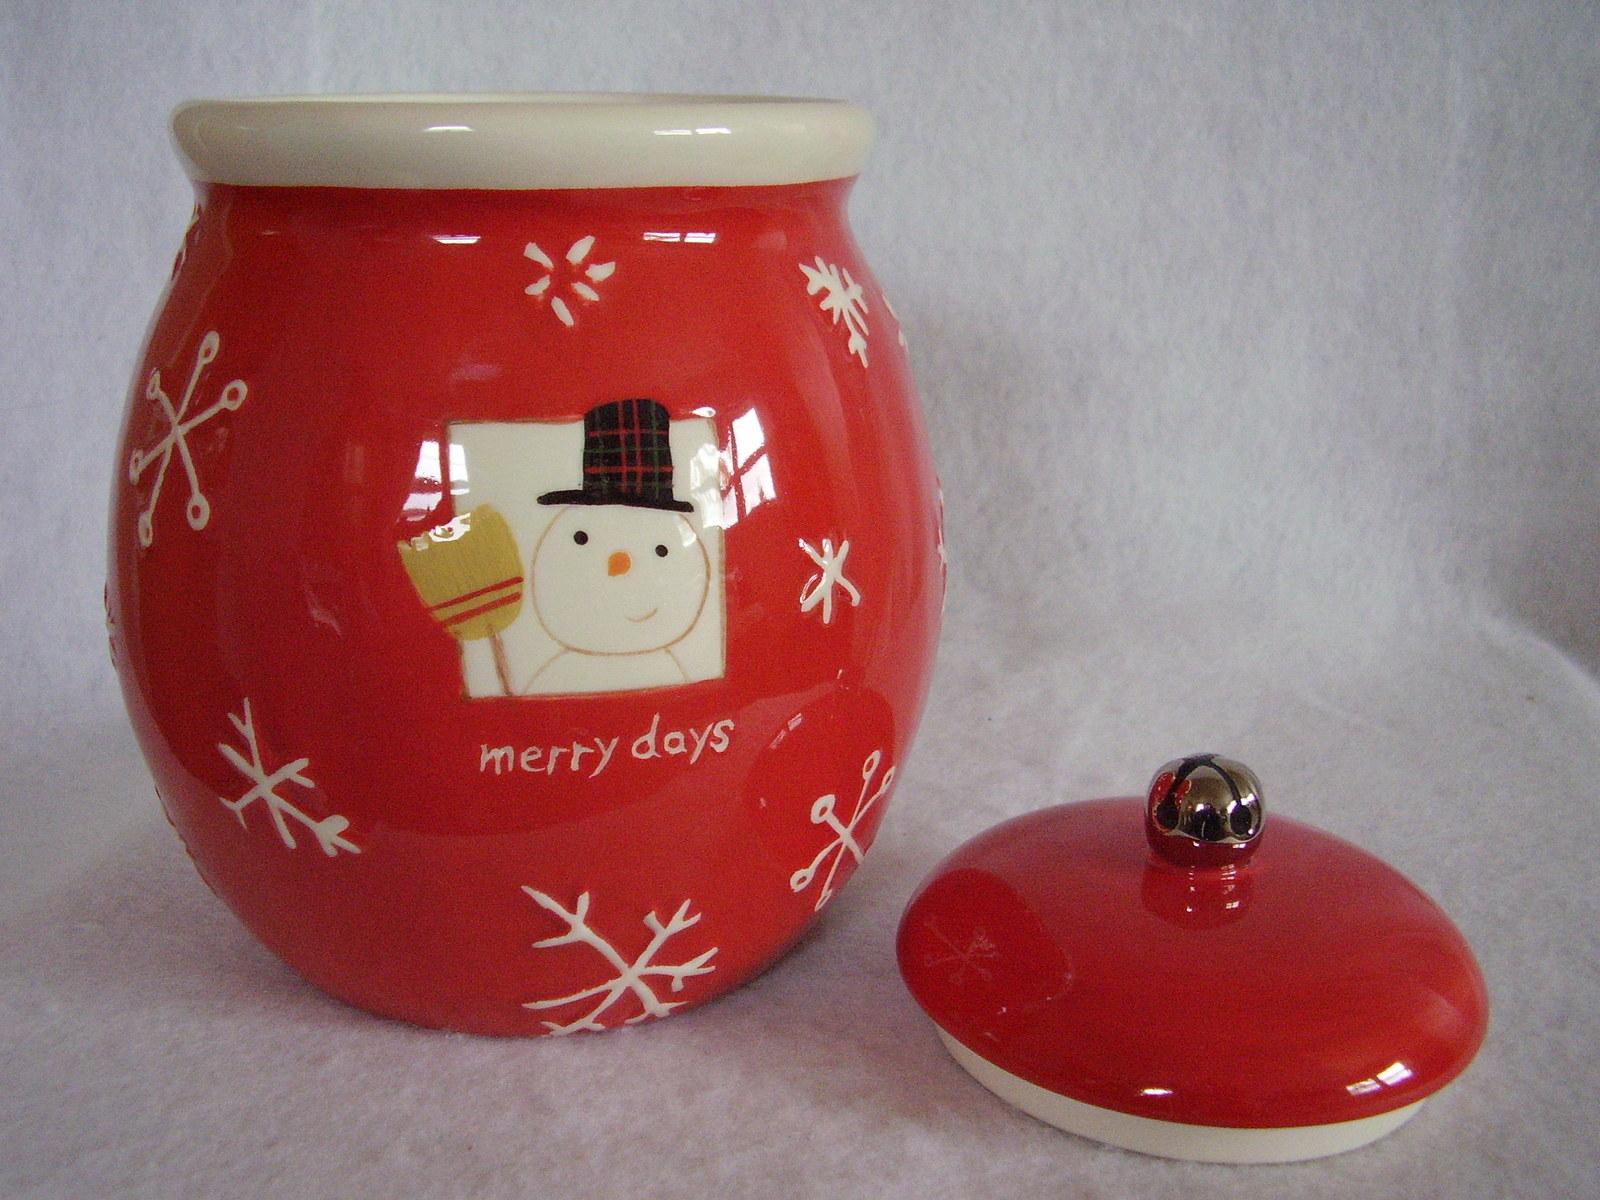 Hallmark Christmas Cookie Treat Jar Merry Days Snowman Snowflakes Jingle Bell image 6